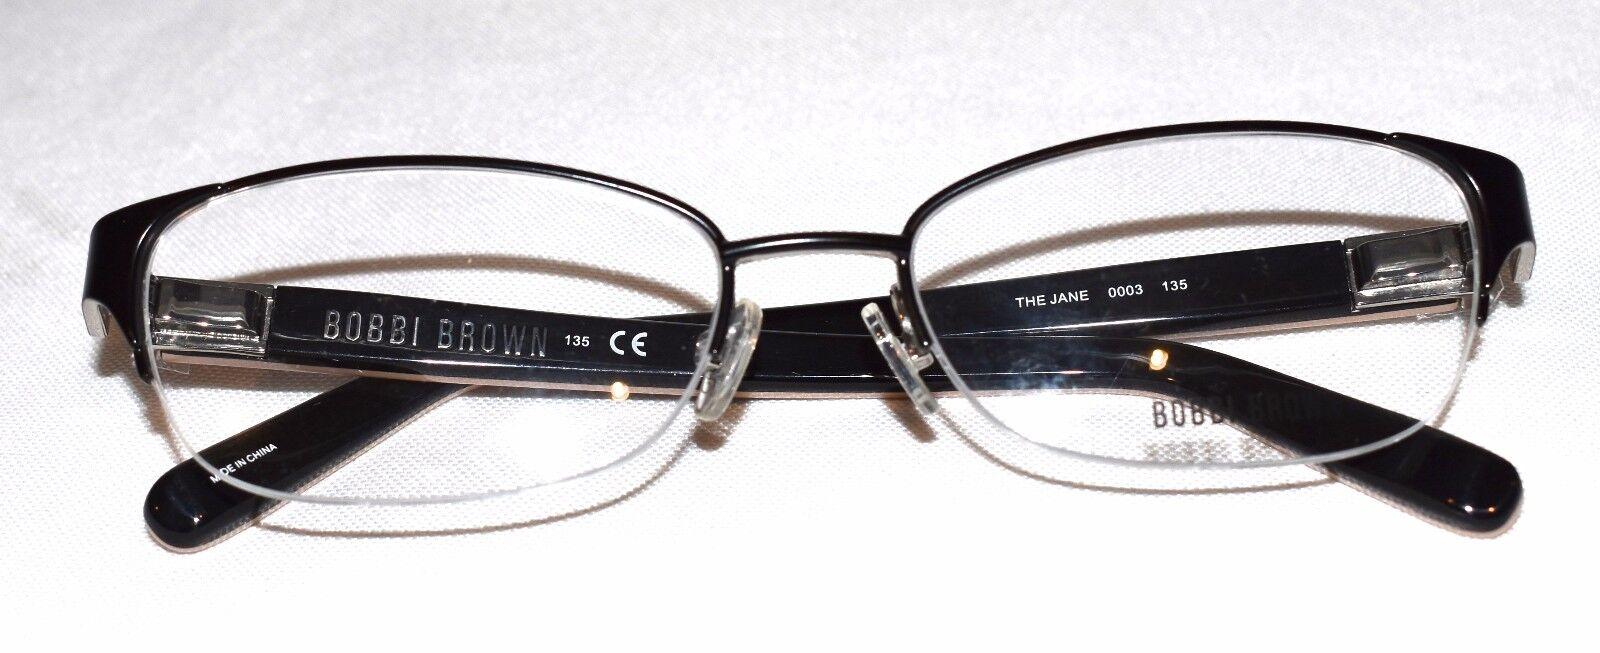 Bobbi Brown The Jane 0003 Eyeglass/glasses Frames 53-17-135 | eBay